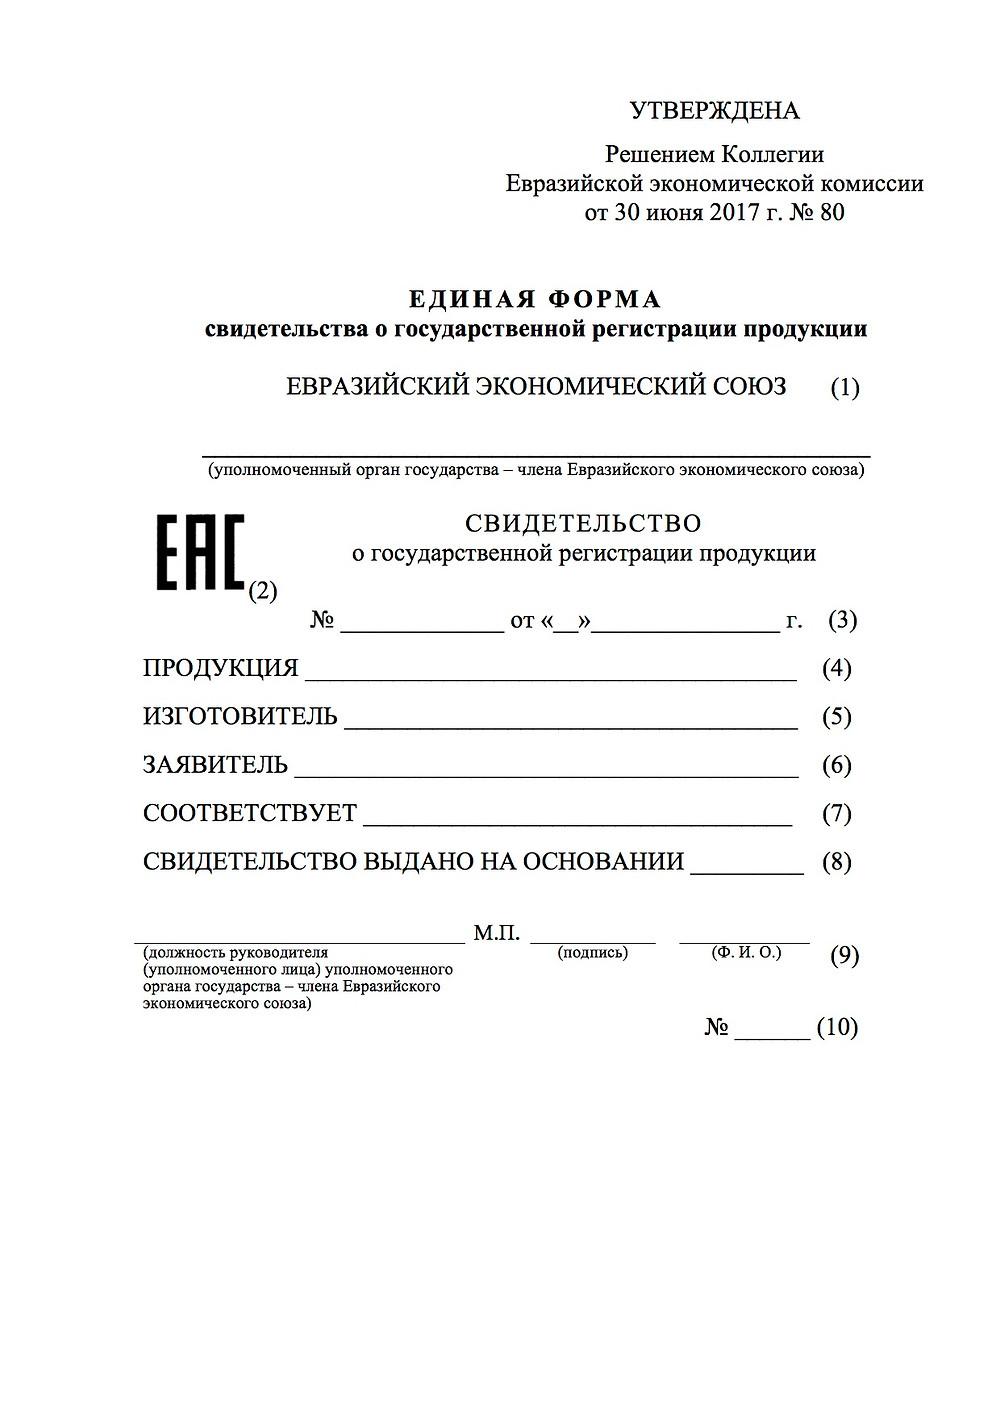 Единая форма СГР с 01.06.2019